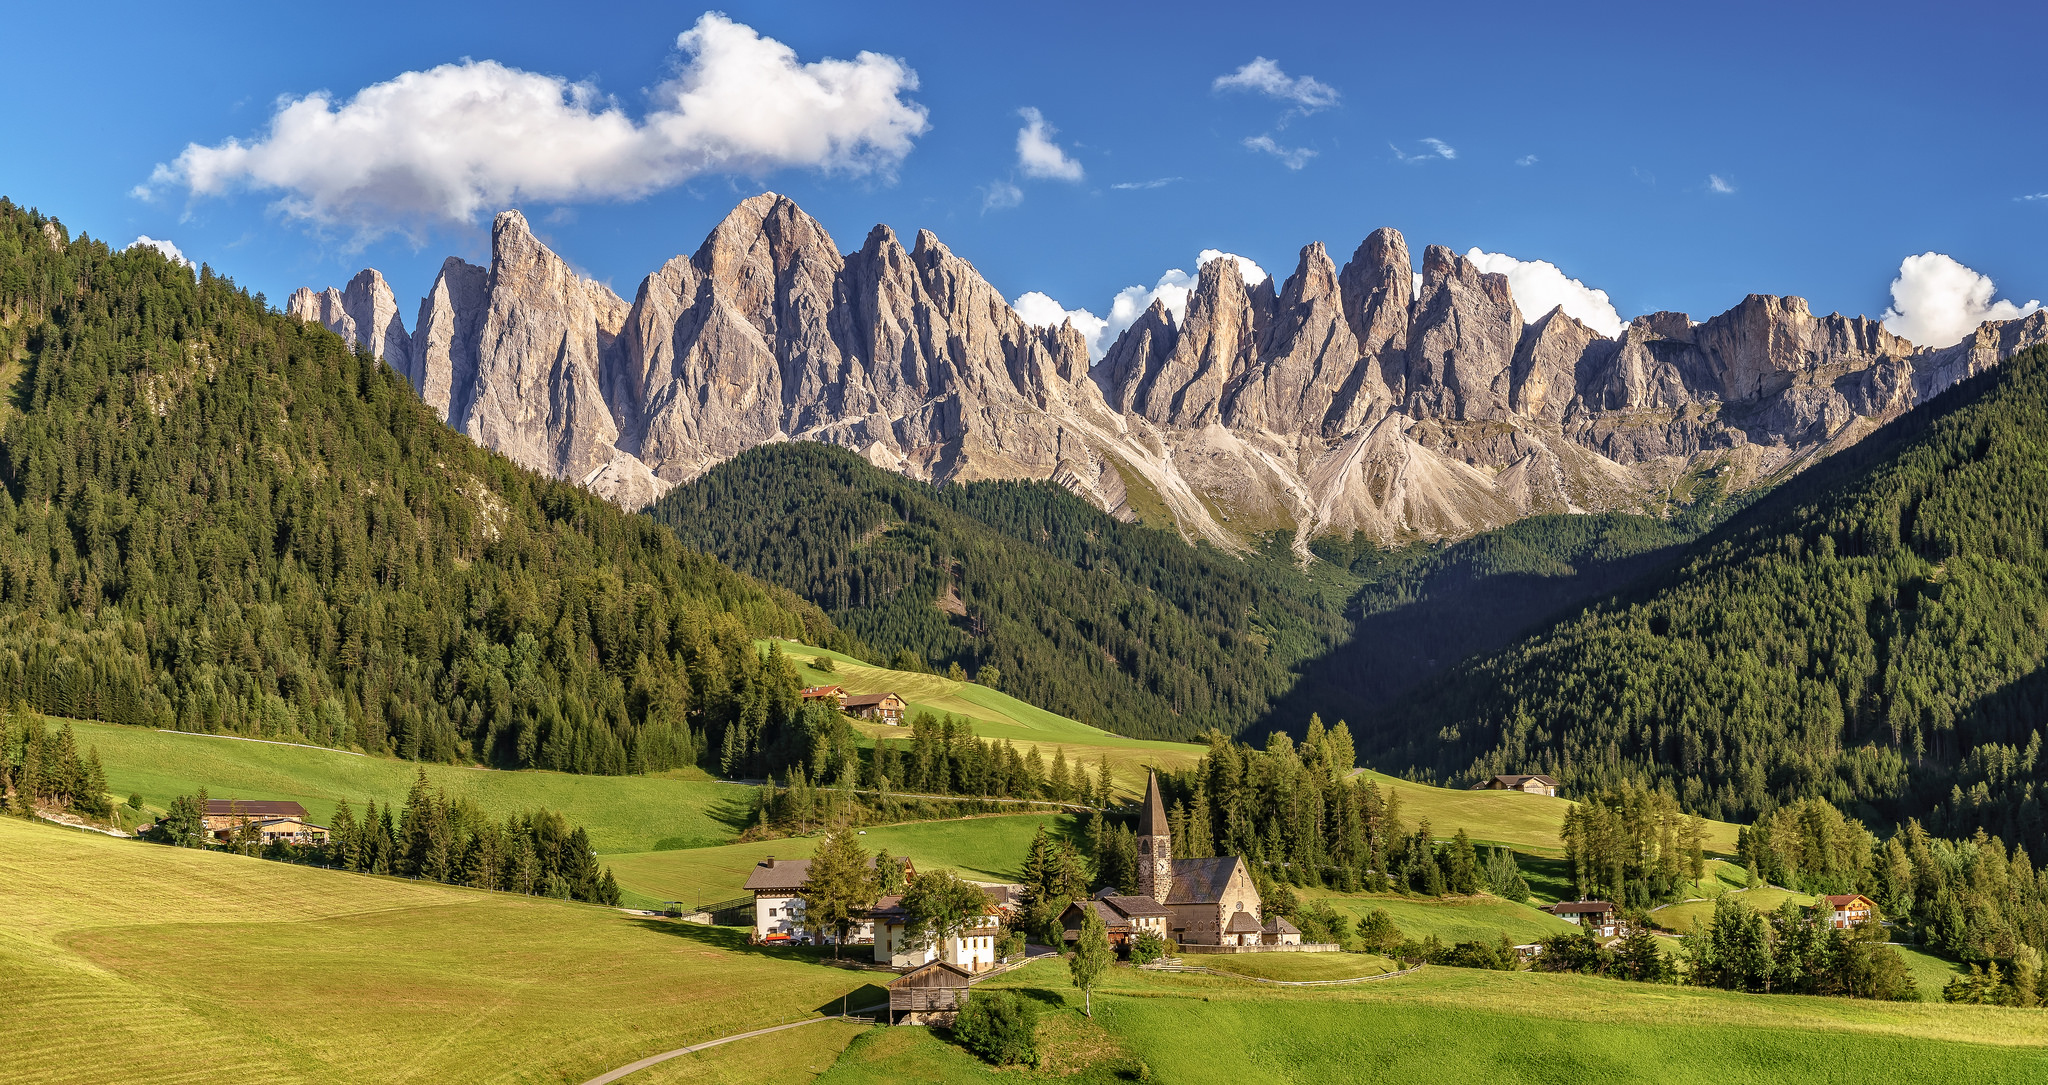 Dolomite Alps, South Tyrol, Italy